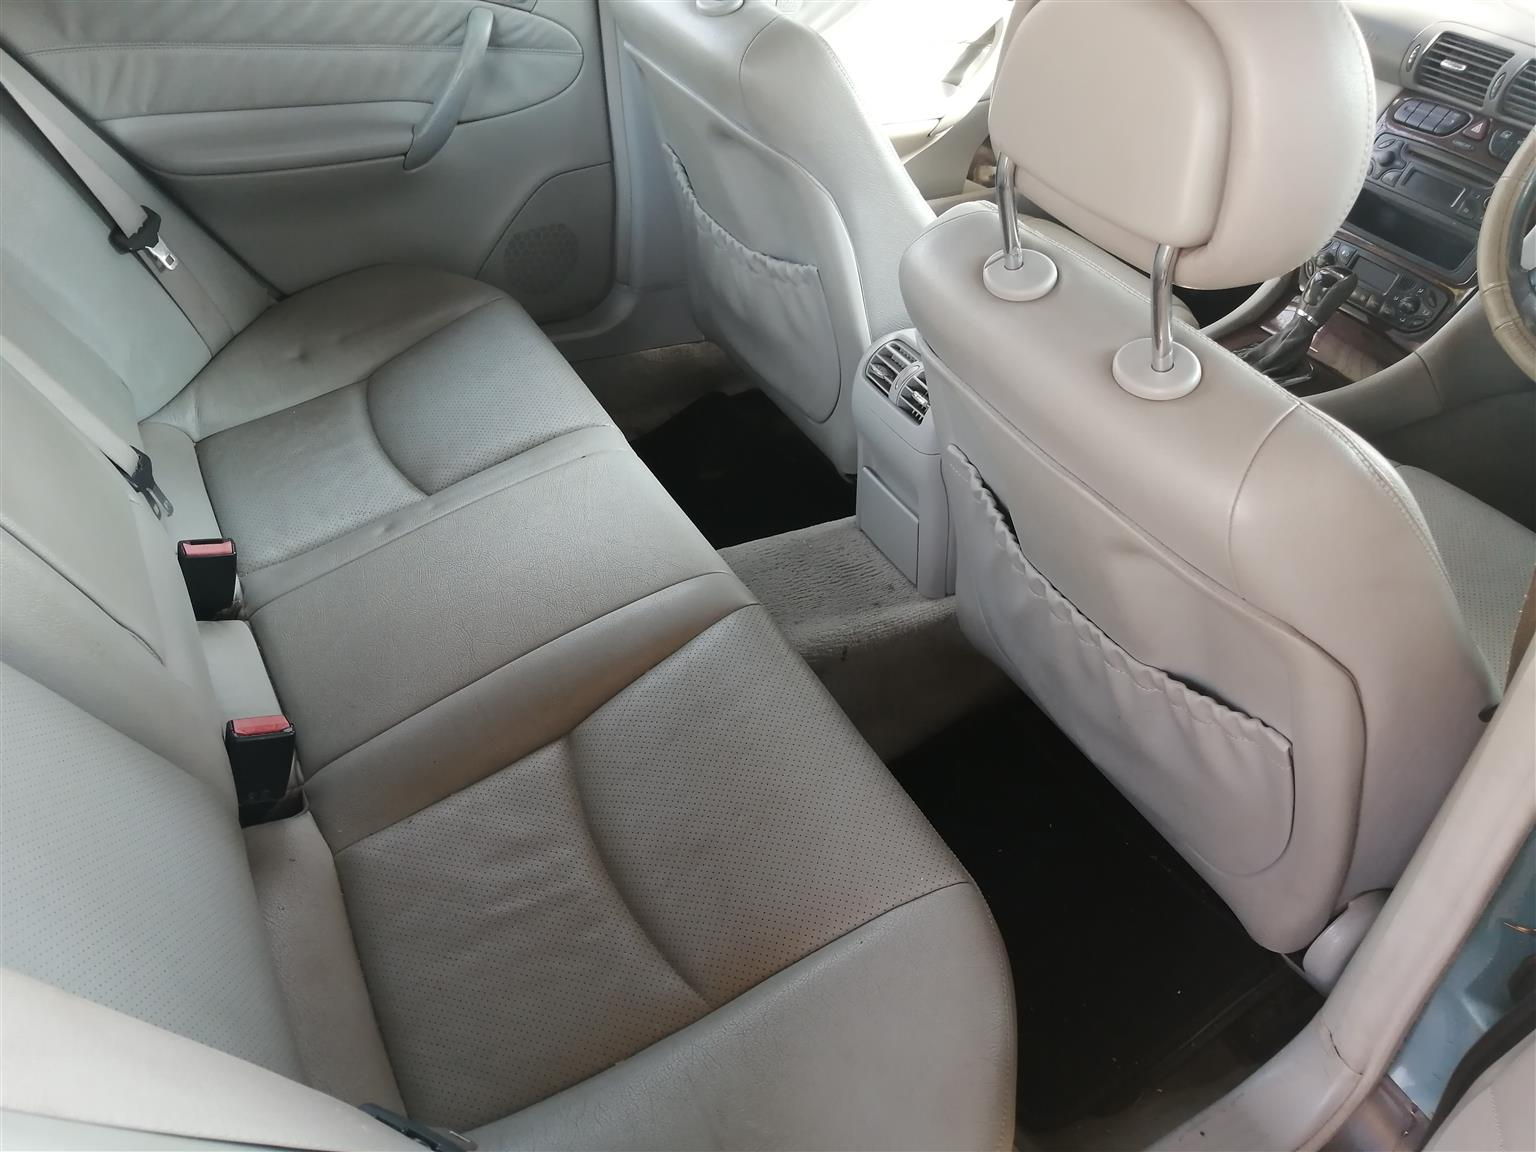 2003 C320 Mercedes Benz For Sale